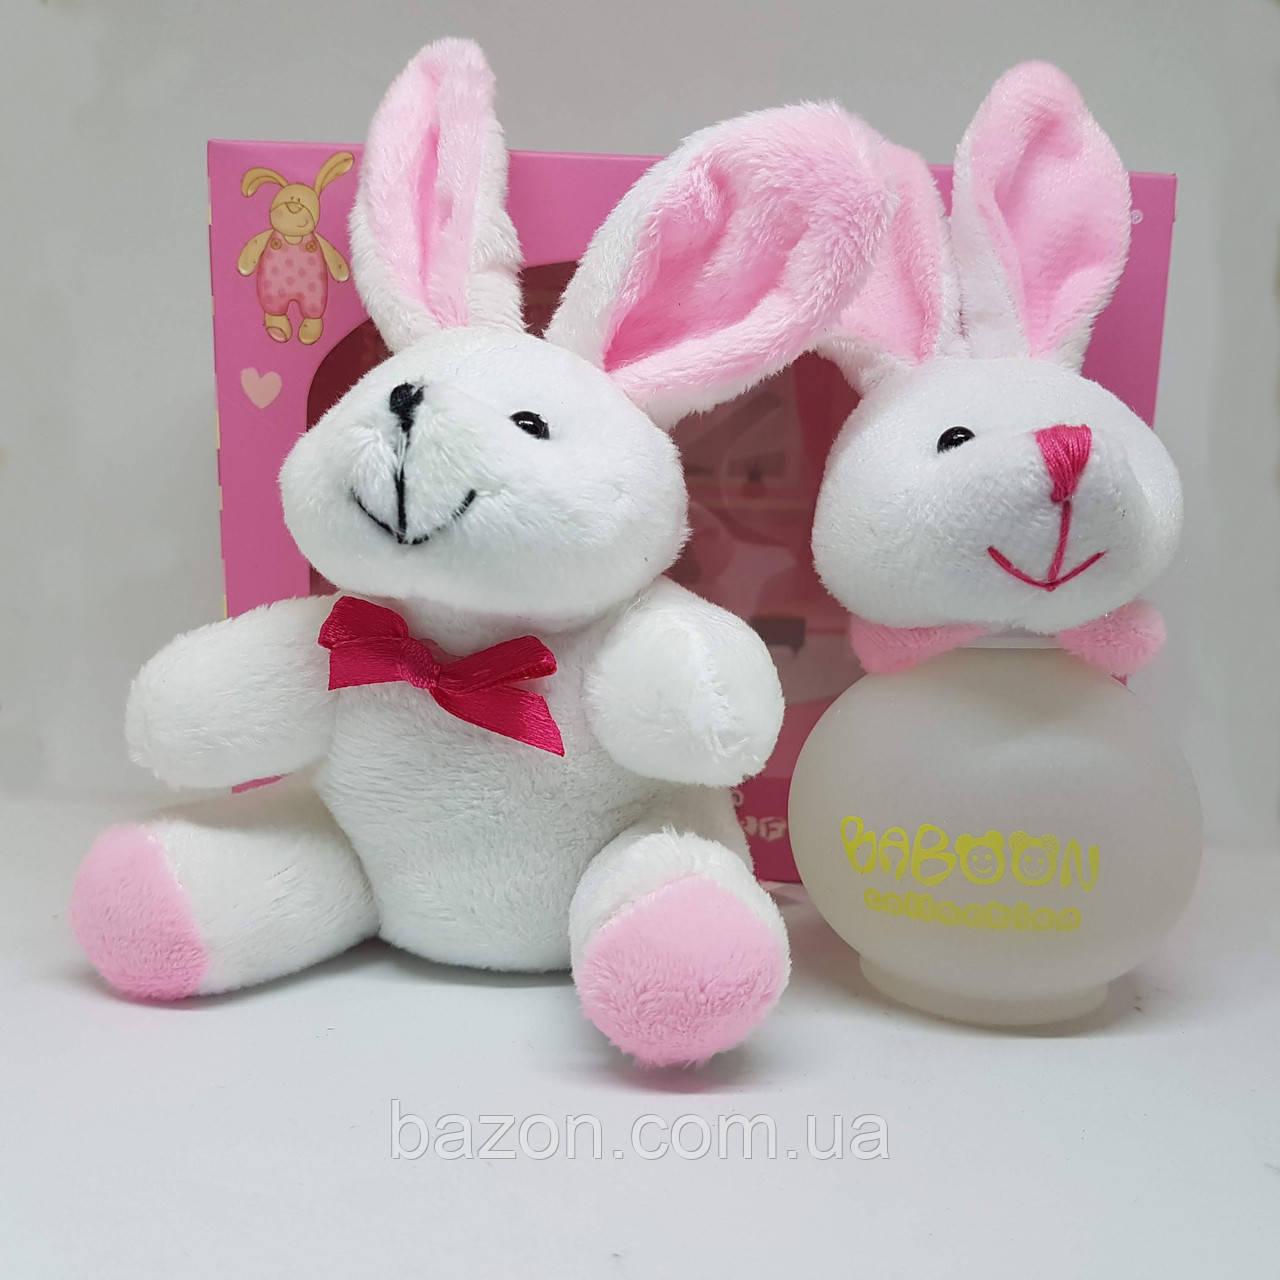 Детский набор парфюм и игрушка Surbby Baboon